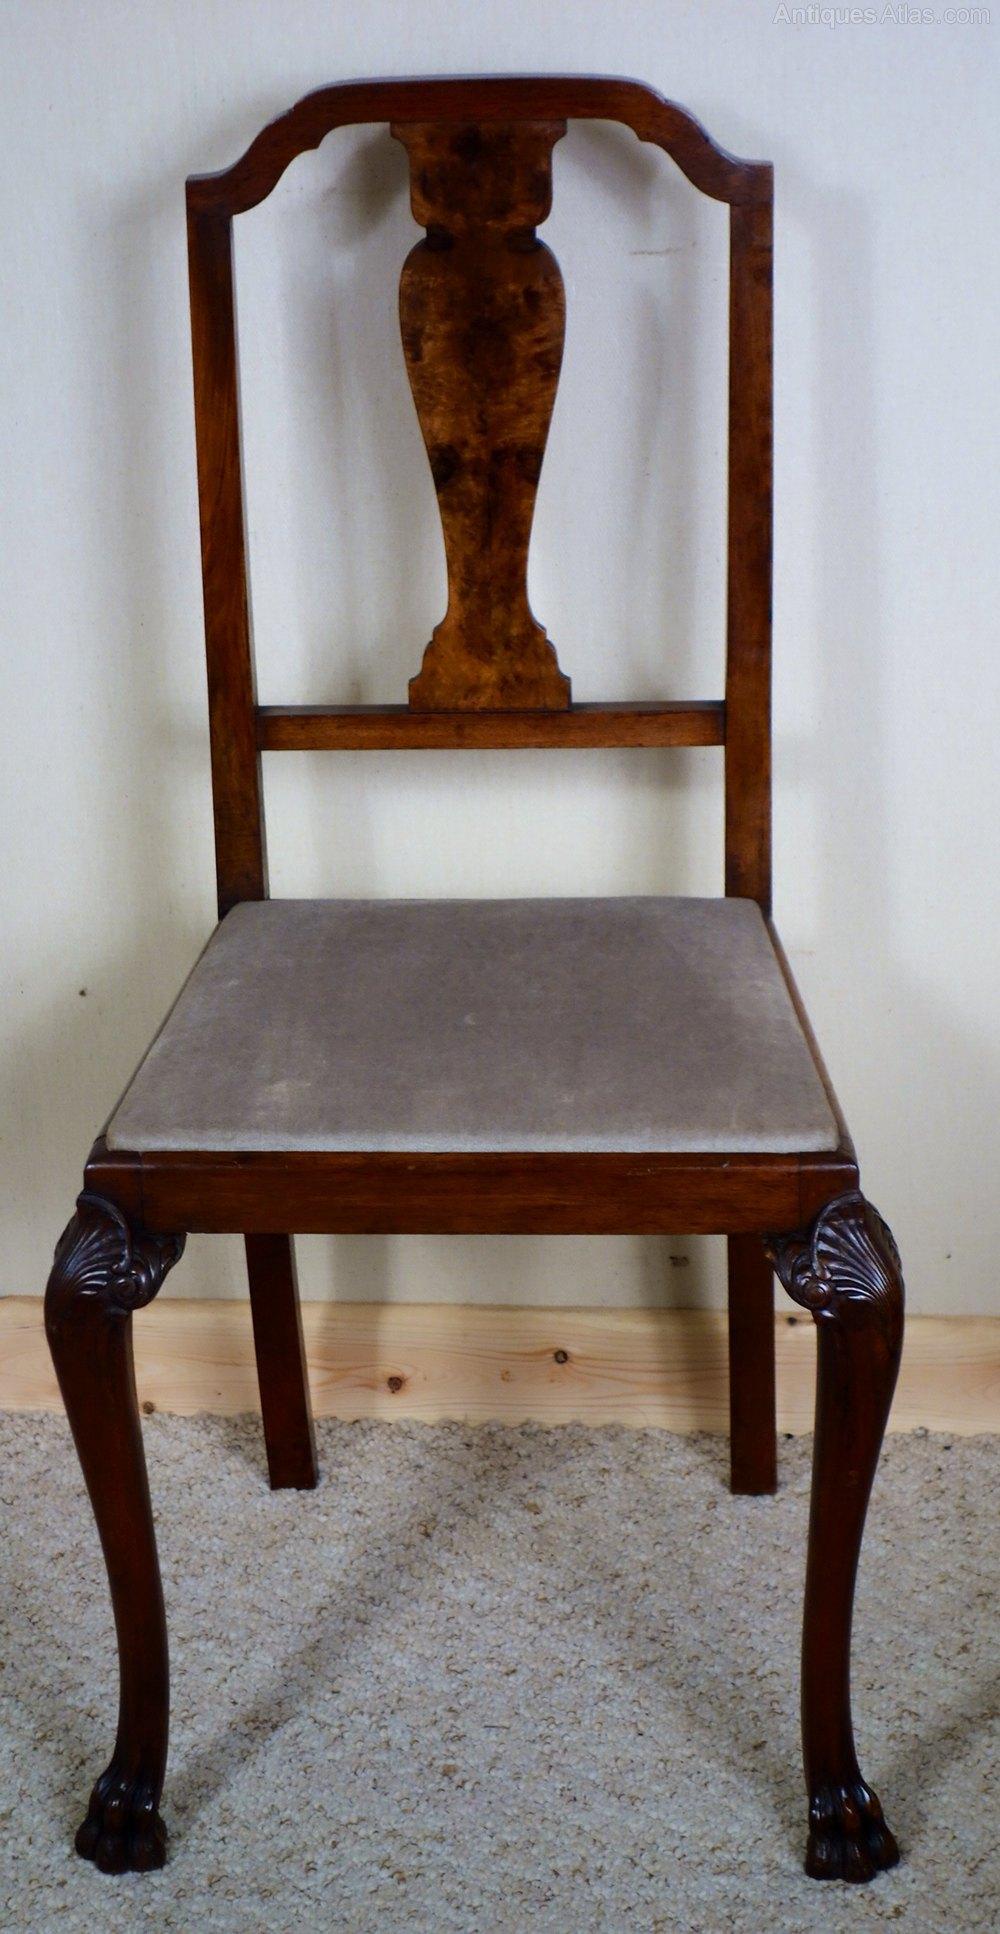 Elegant walnut bedroom chair antiques atlas - Vintage pieces of furniture old times elegance ...